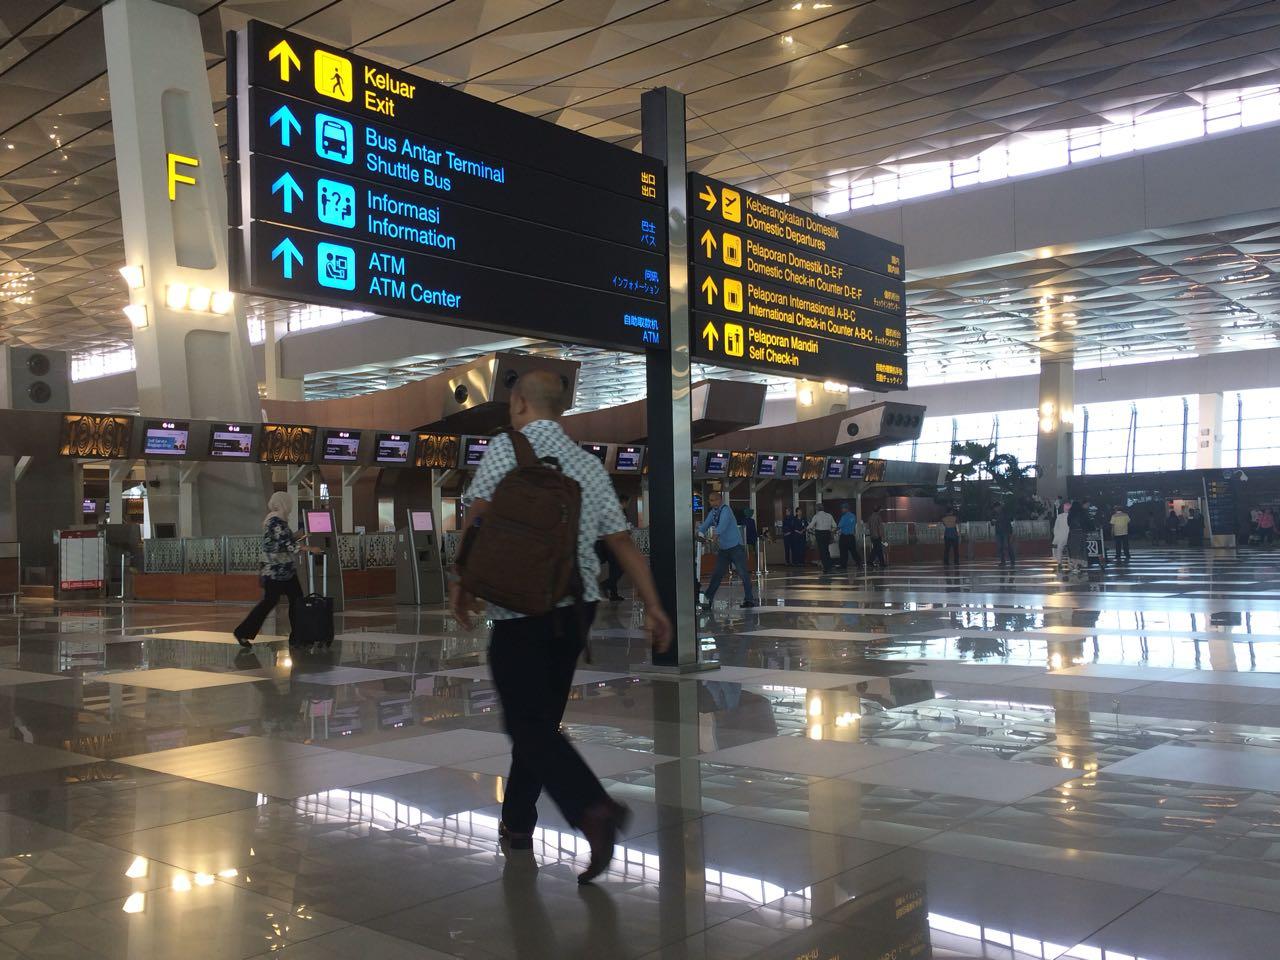 https: img-z.okeinfo.net content 2019 04 20 320 2045798 sebelum-beroperasi-bandara-internasional-yogyakarta-lakukan-simulasi-mw2pWUEAfb.jpg